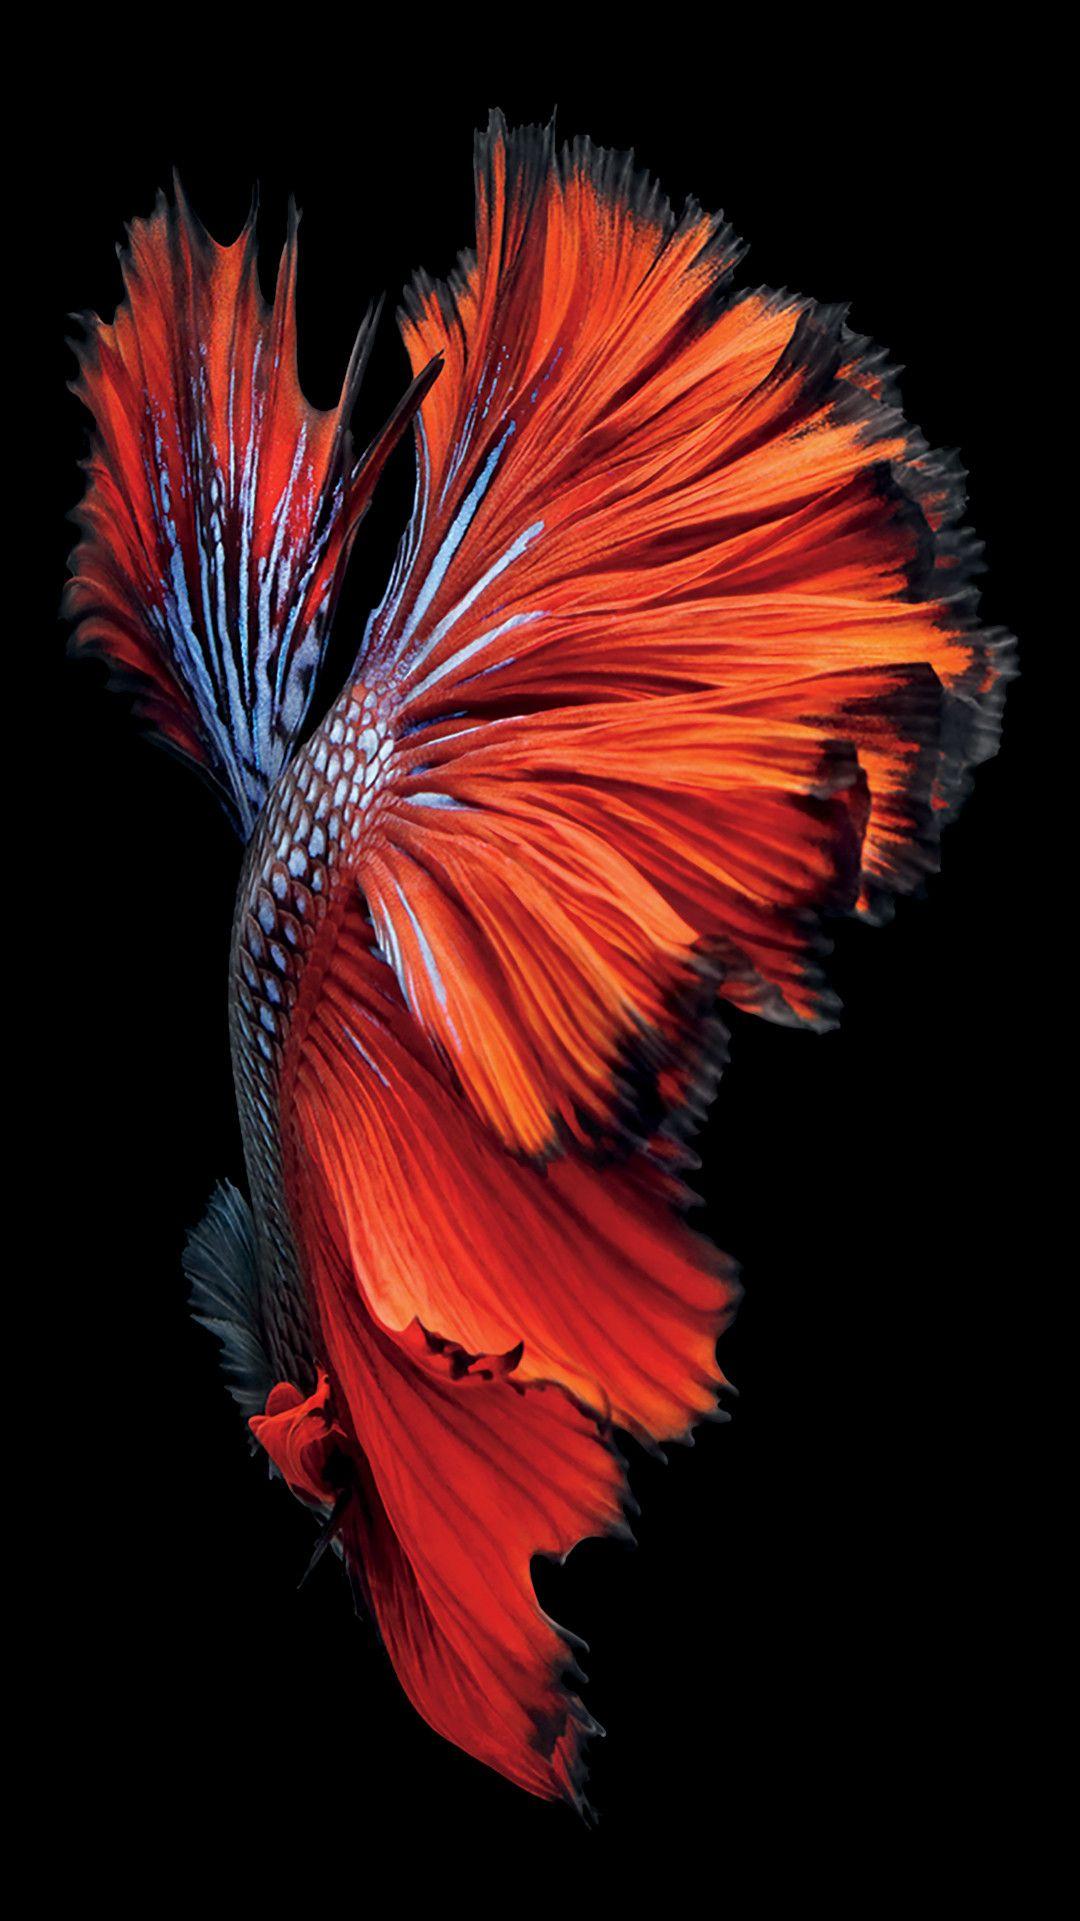 35 Gambar Wallpaper Hd Iphone Fish Terbaru 2020 Ikan Cupang Binatang Ikan